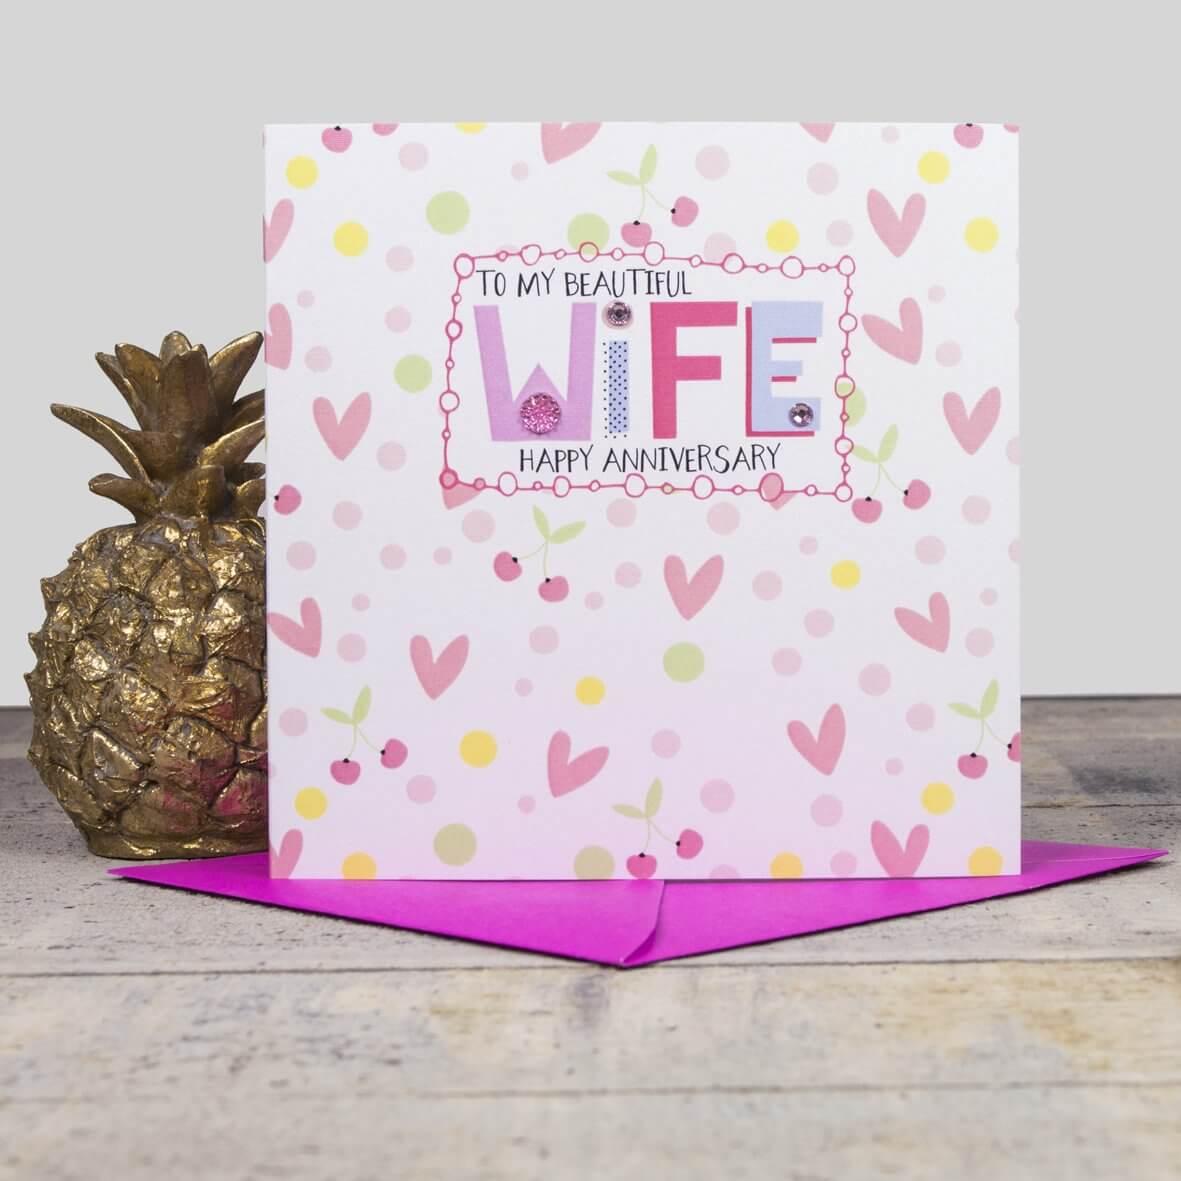 Beautiful Wife - Happy Anniversary Card